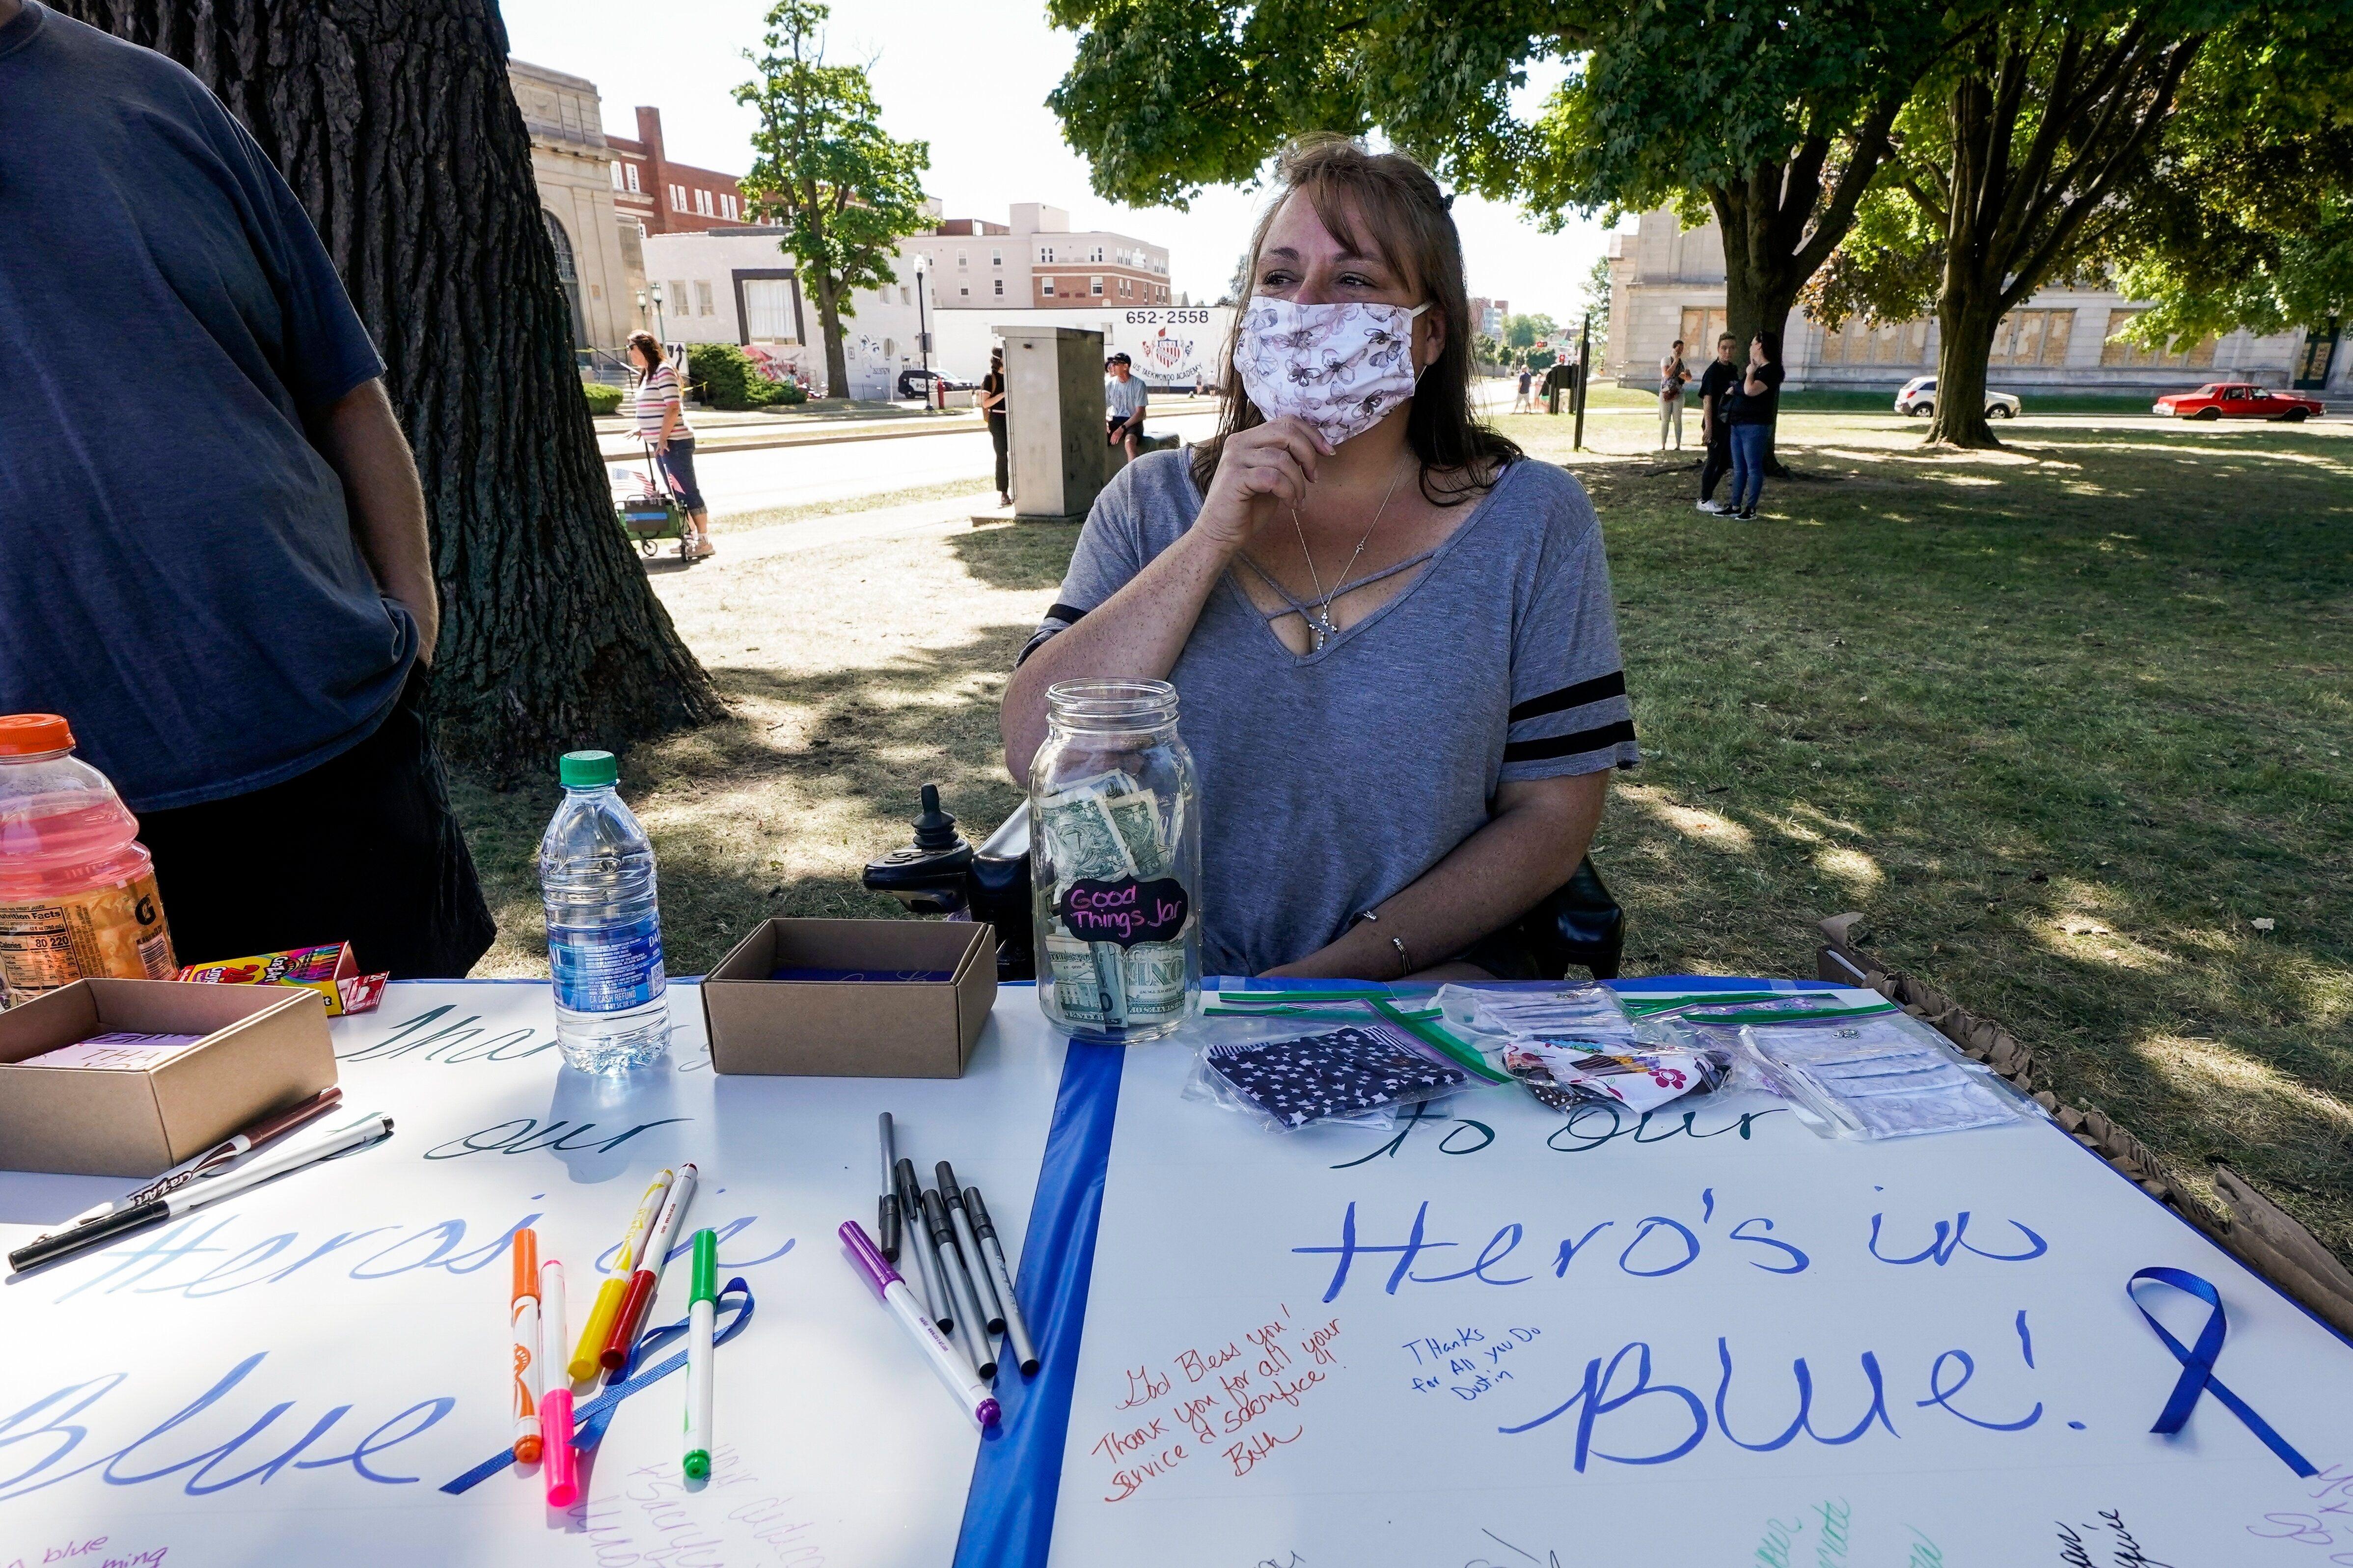 Jennifer Payton participates in a Blue Lives Matter rally Sunday, Aug. 30, 2020, in Kenosha, Wisconsin.